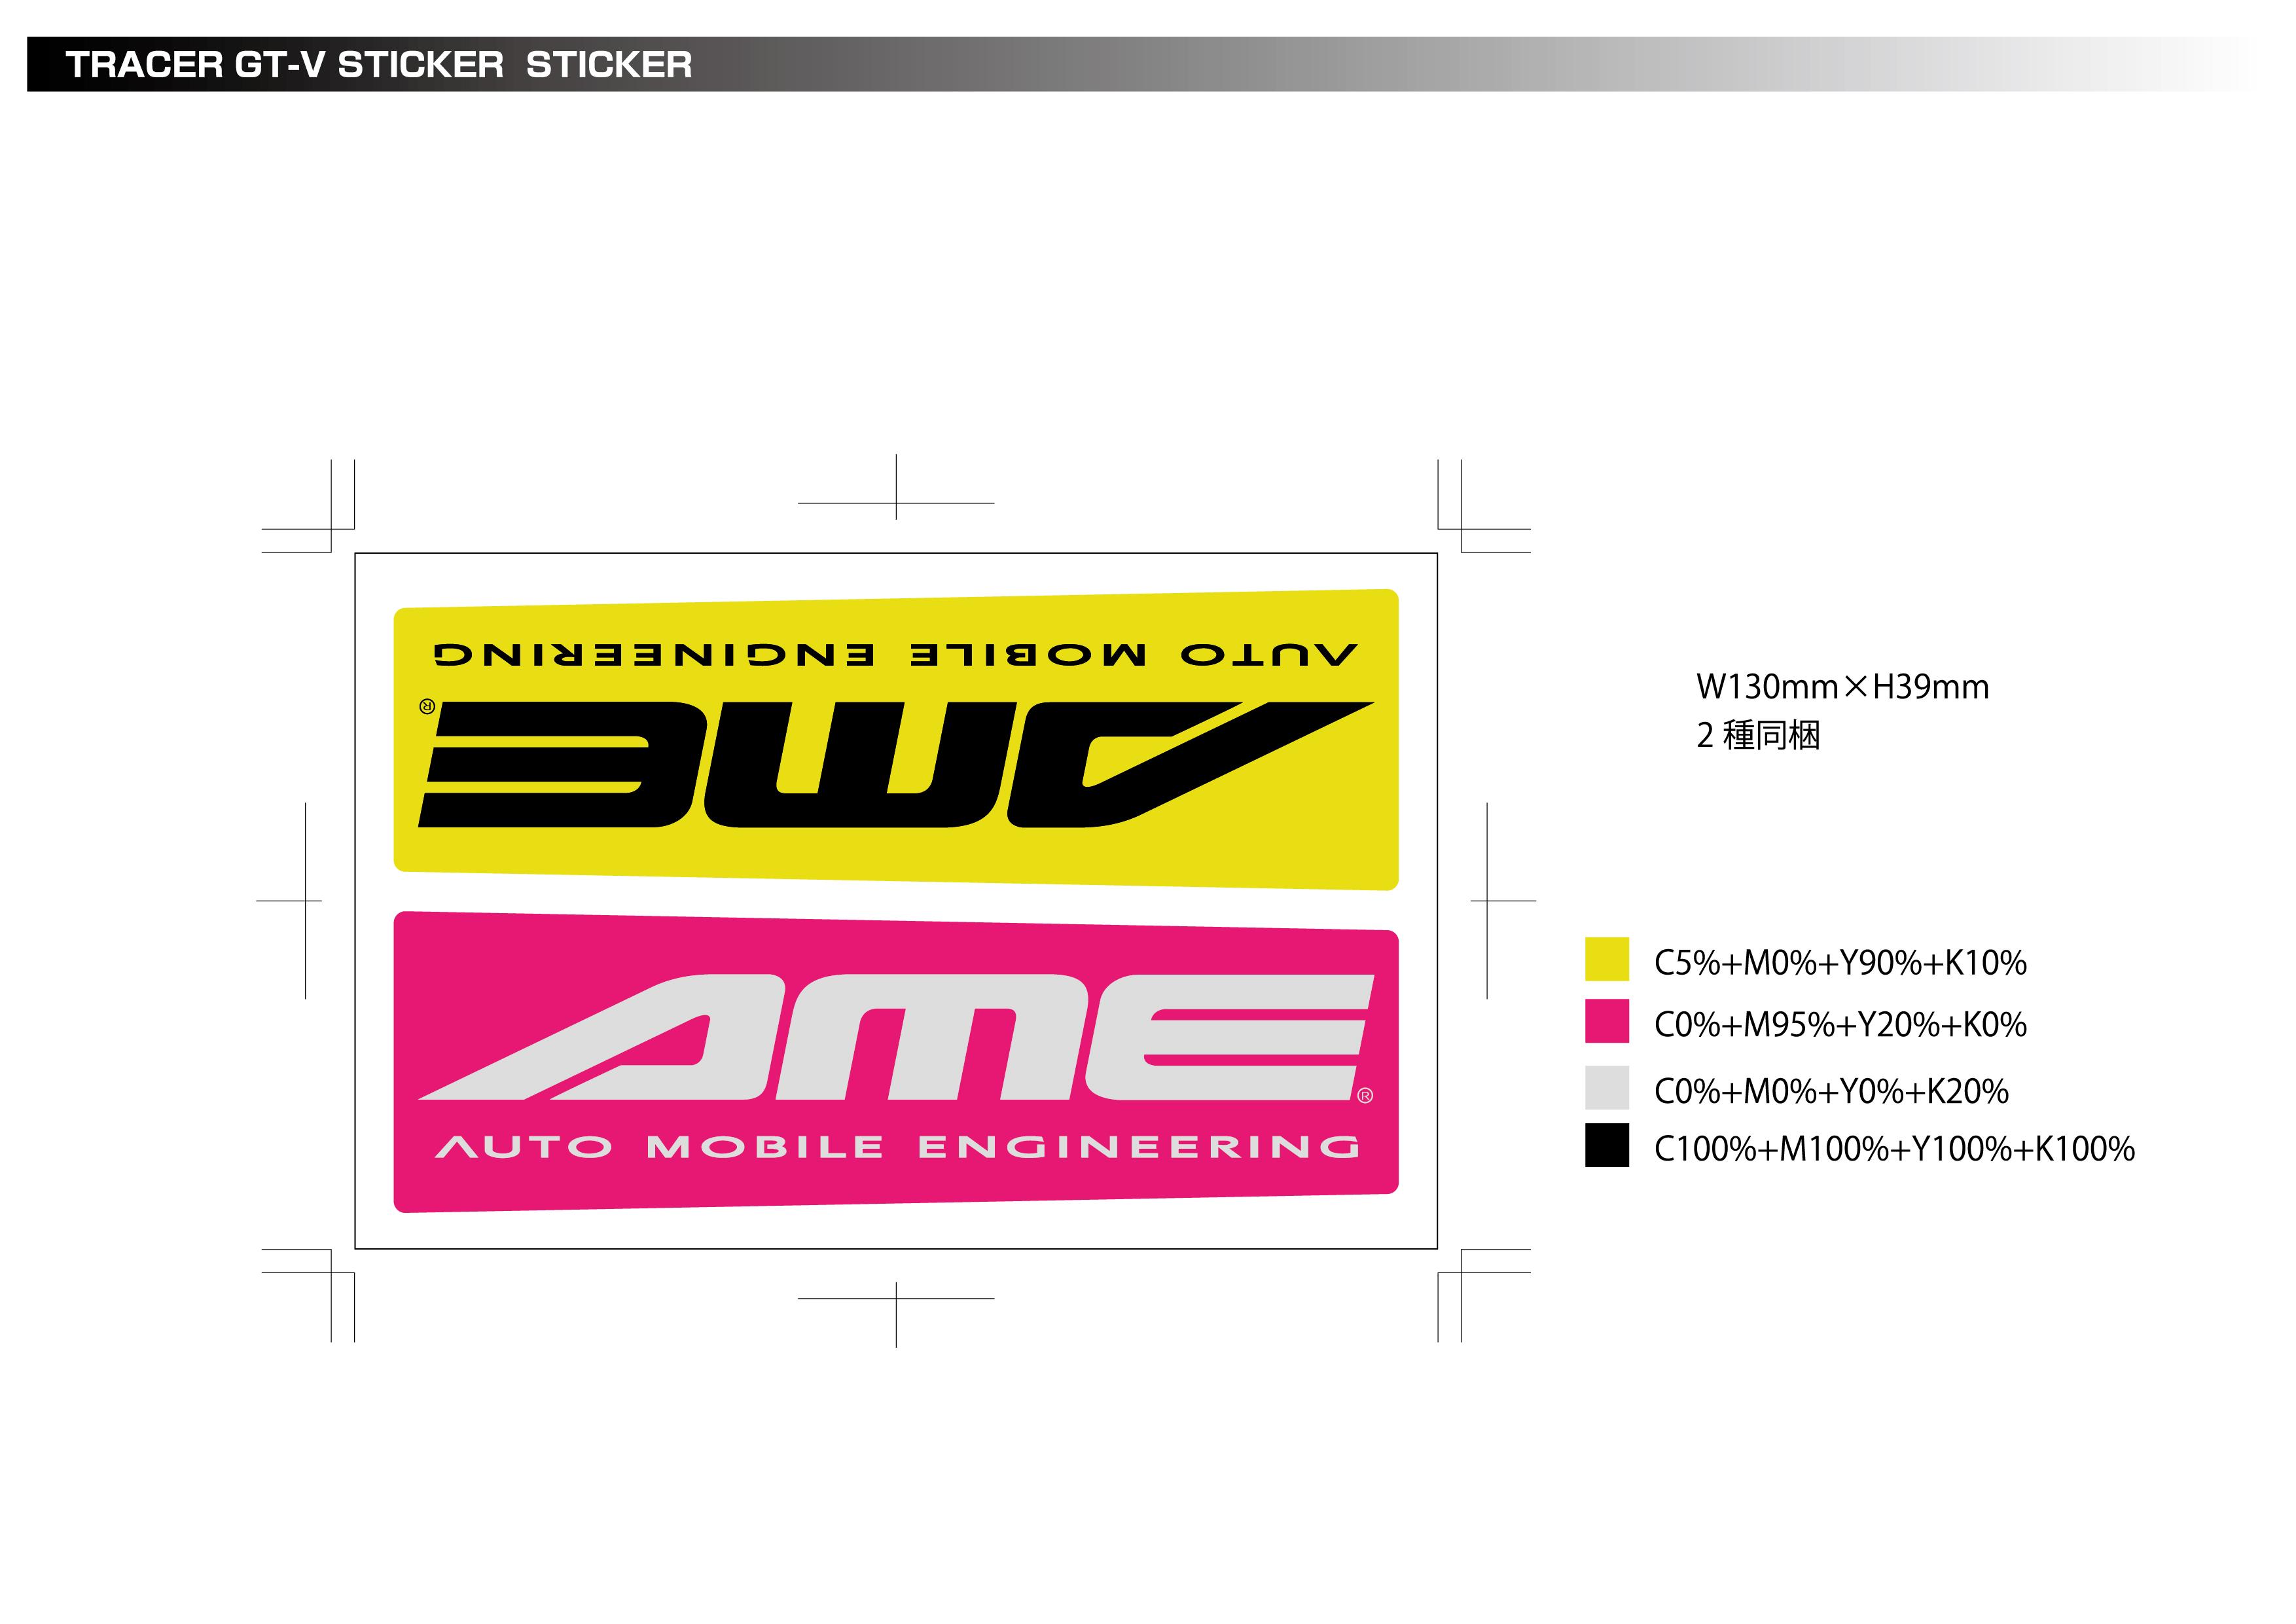 AMEの総力を注ぎ込んだリアルスポーツホイール 【トレーサーGT-V】 - AME Wheels, AME Wheel, AME